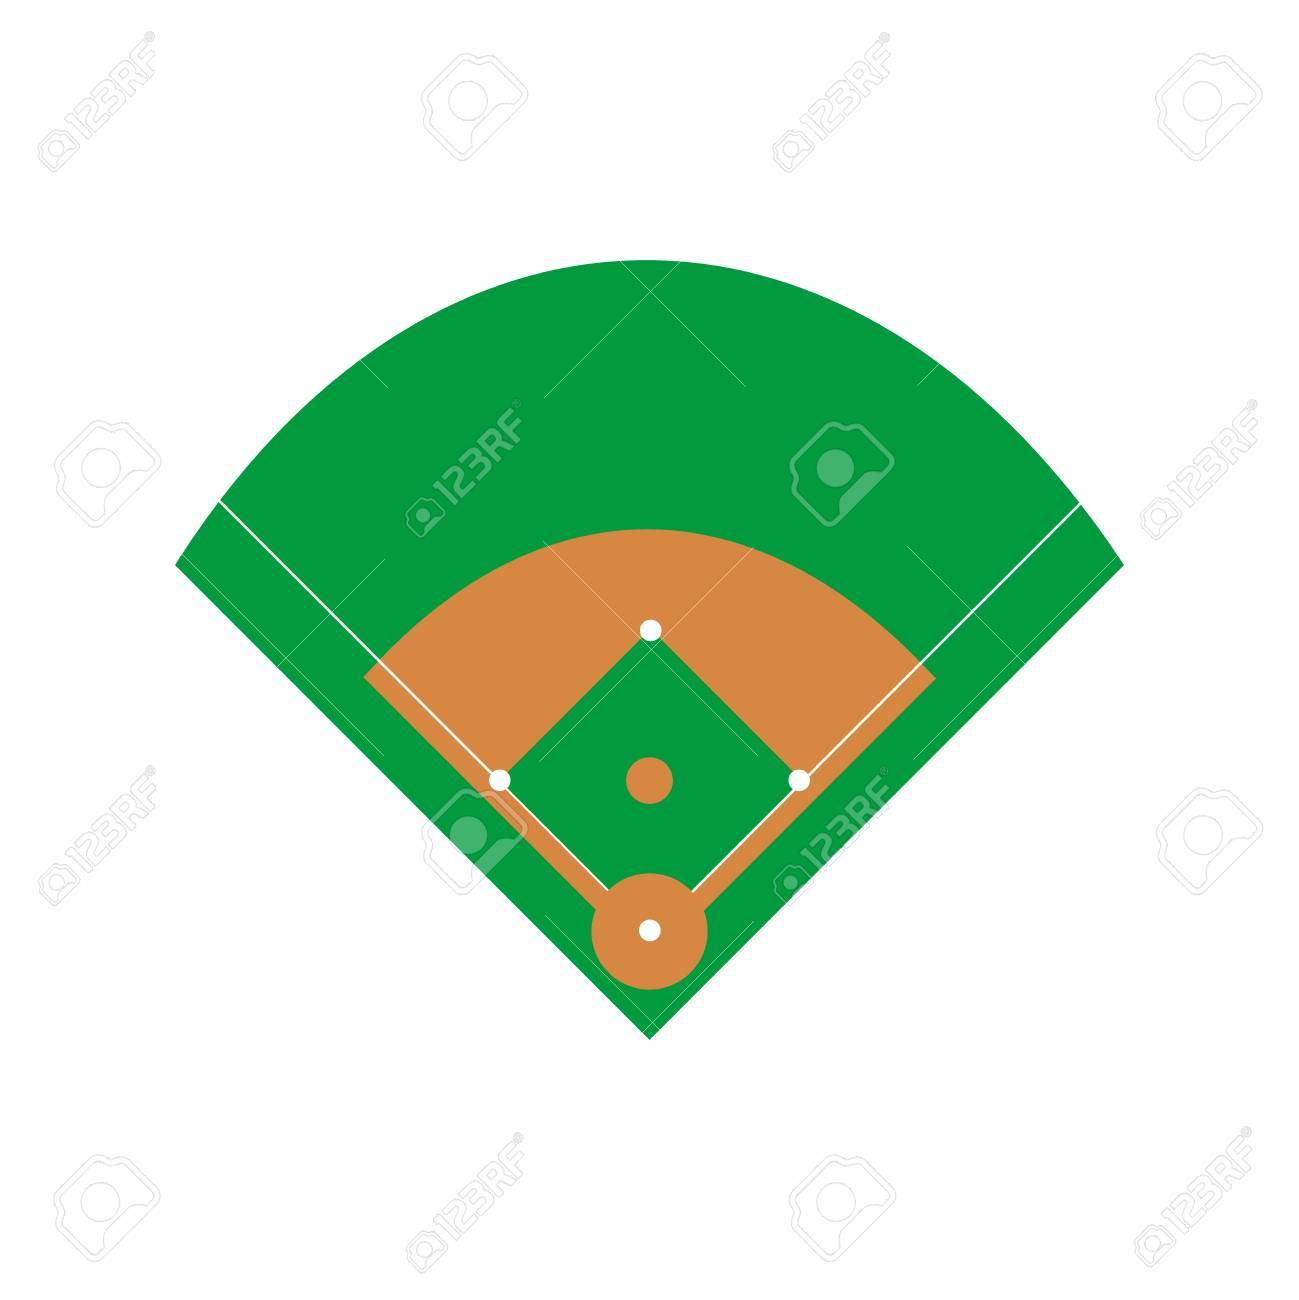 baseball field vector american game base template royalty free